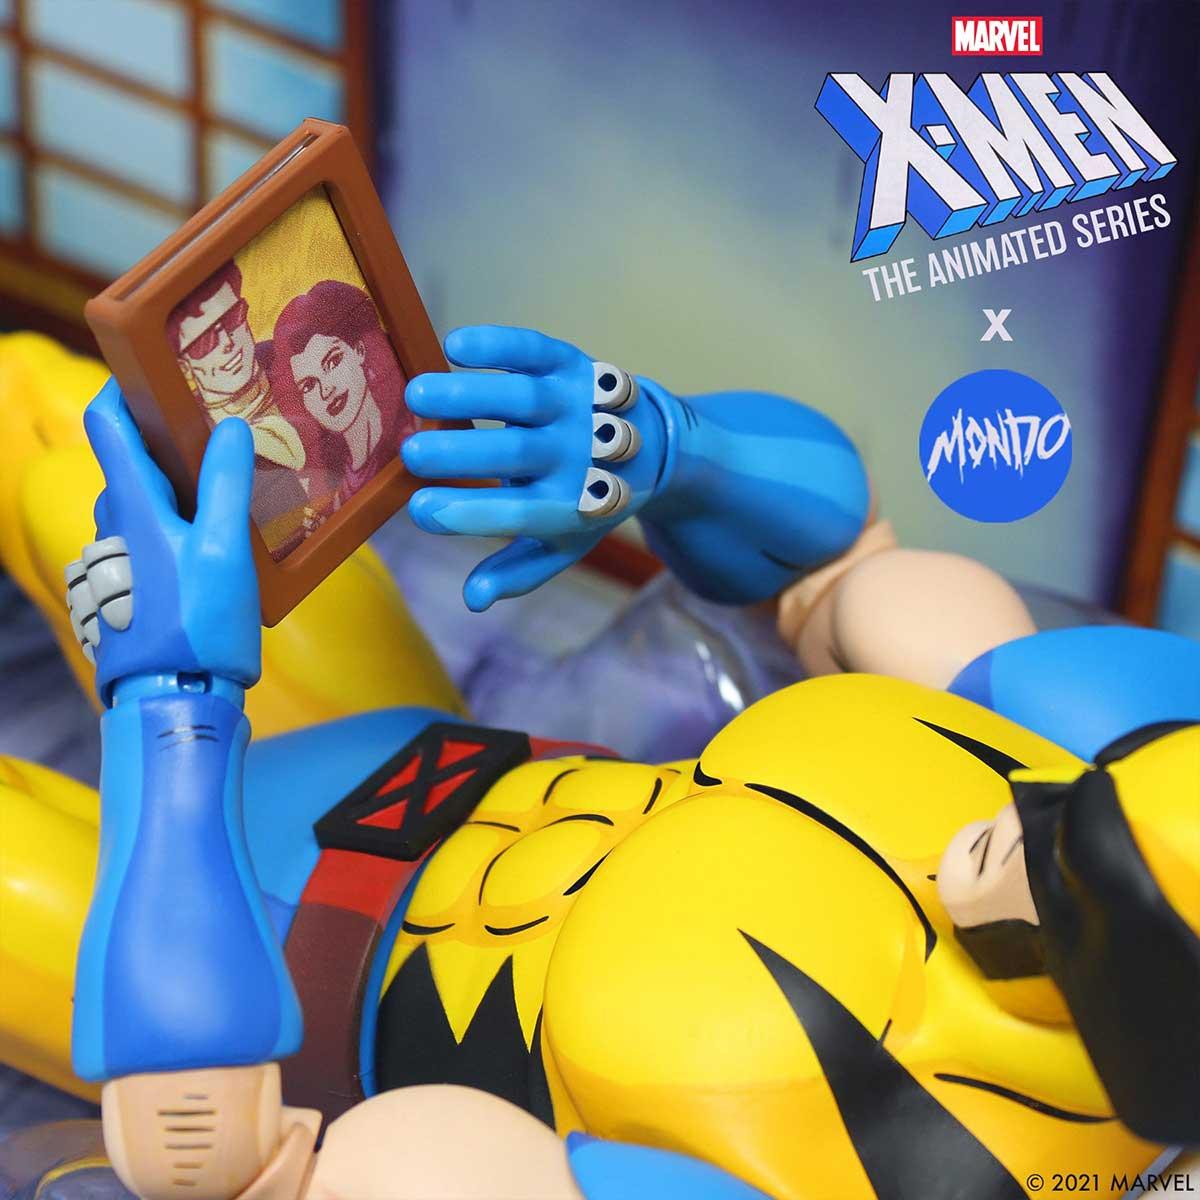 Wolverine 1/6 Scale SDCC Action Figure